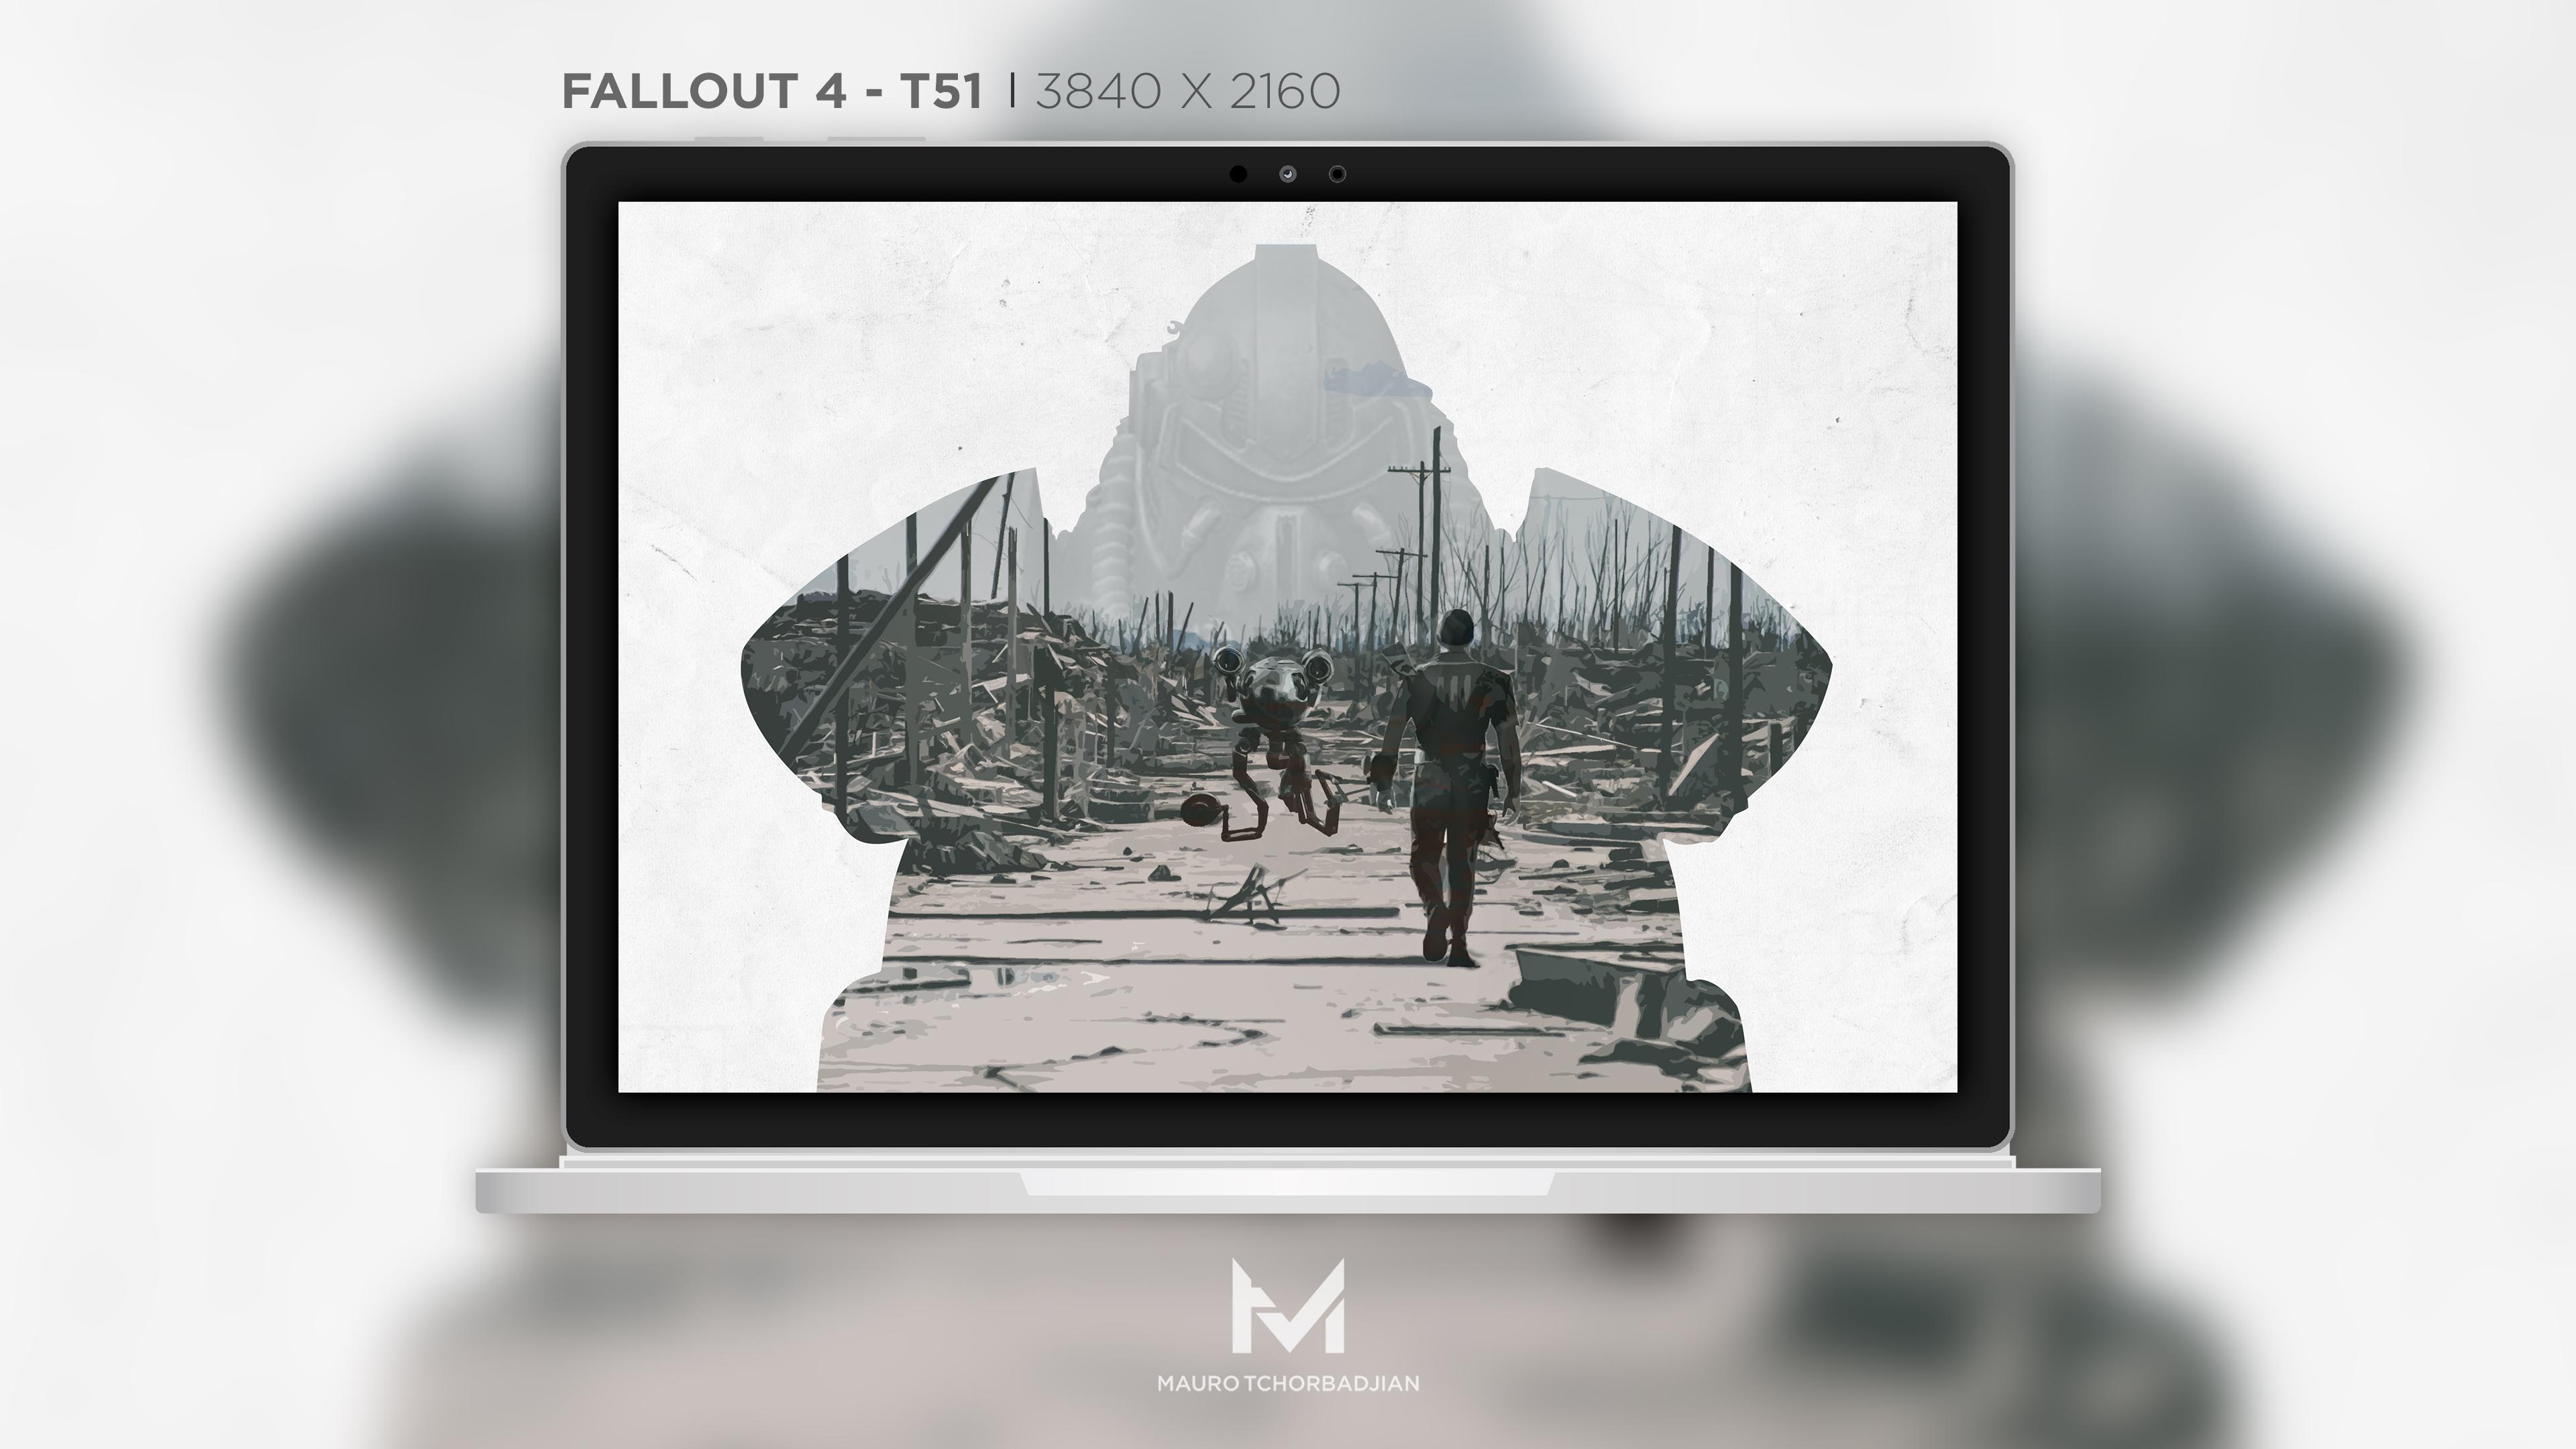 Fallout 4 - T51 - 4K Wallpaper by MauroTch